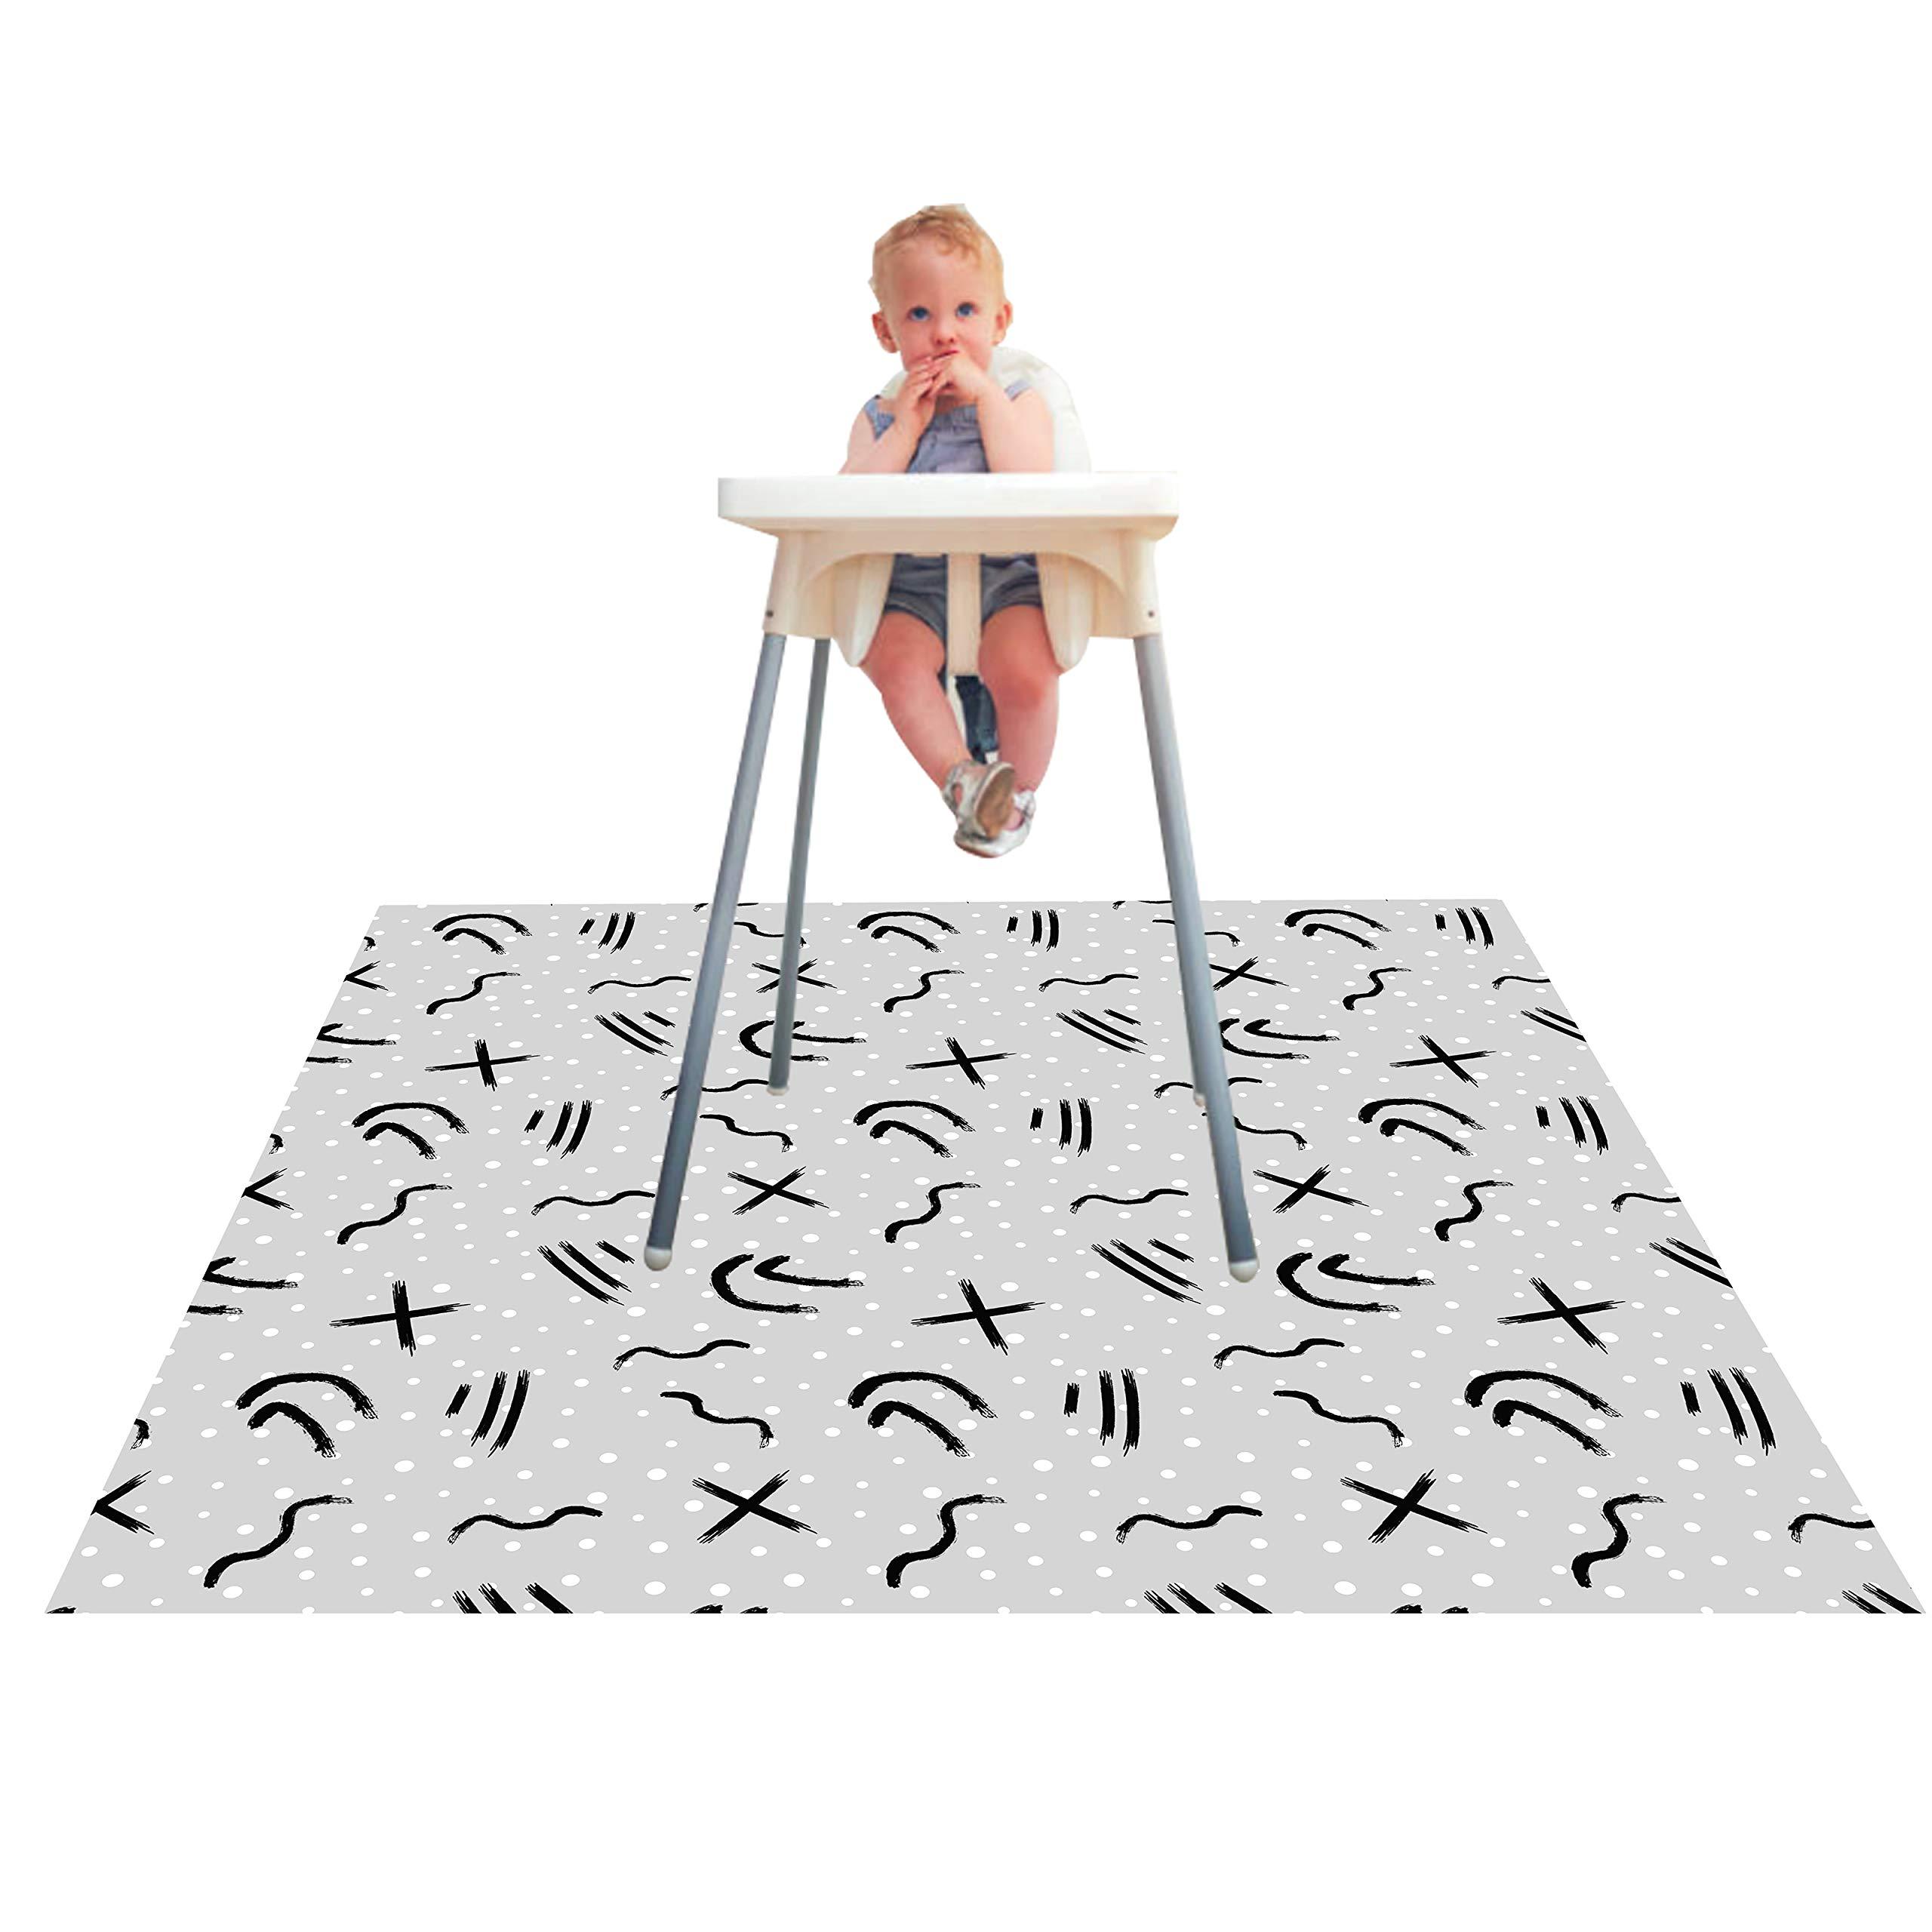 Paw Legend Washable Highchair Splat Mat for Floor- Anti-Slip Splash Mess Mat(53'' X 53'')-Under Highchair Mat-Food Catcher Art Craft Leak Proof Mat (Doodle) by Paw Legend